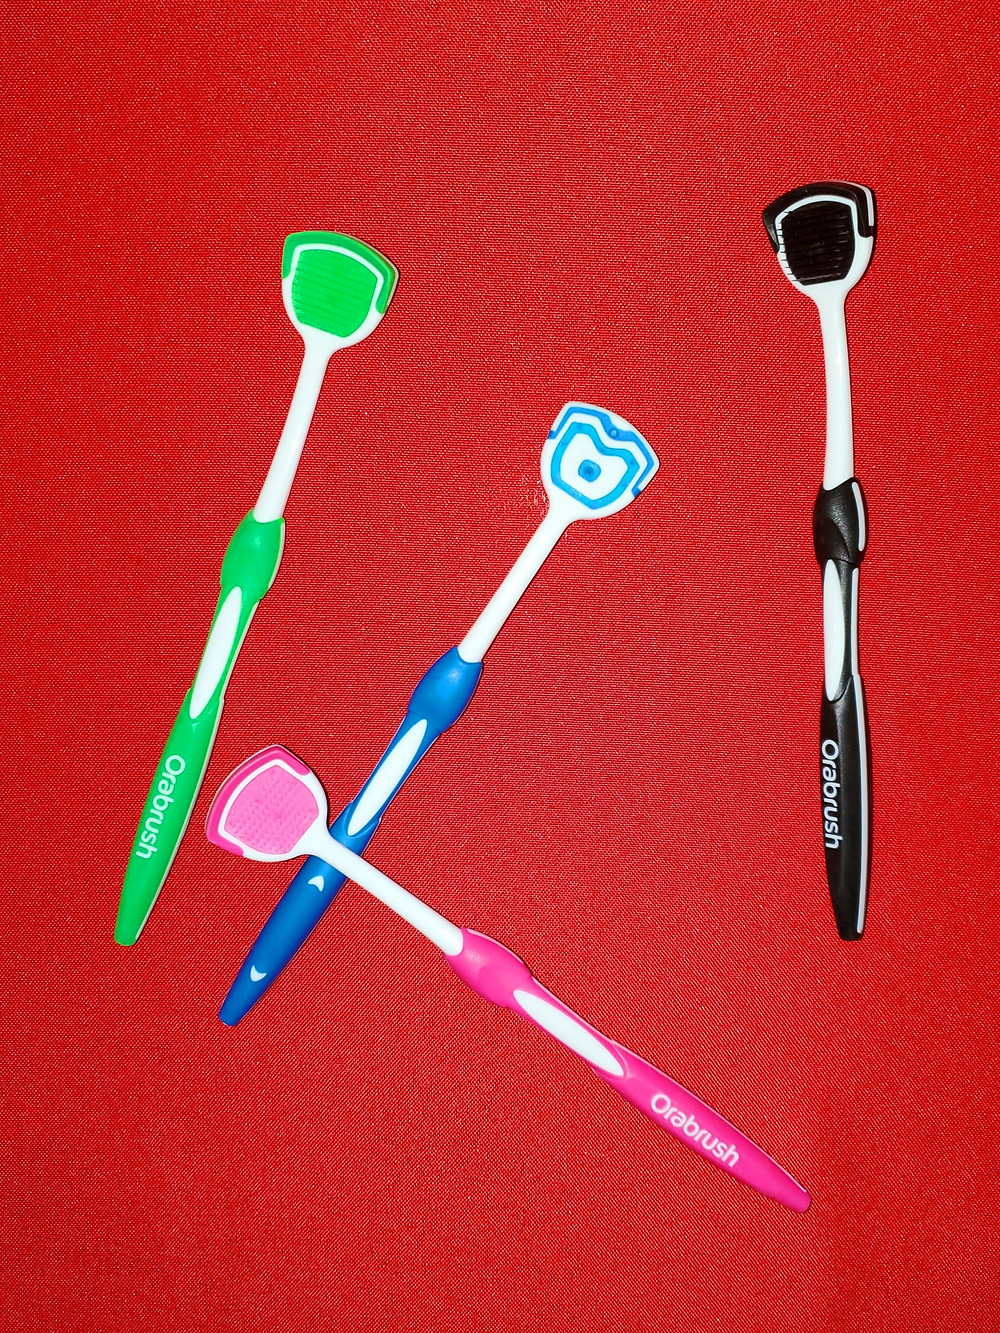 orabrush, tongue scraper, tongue brush, oral aid